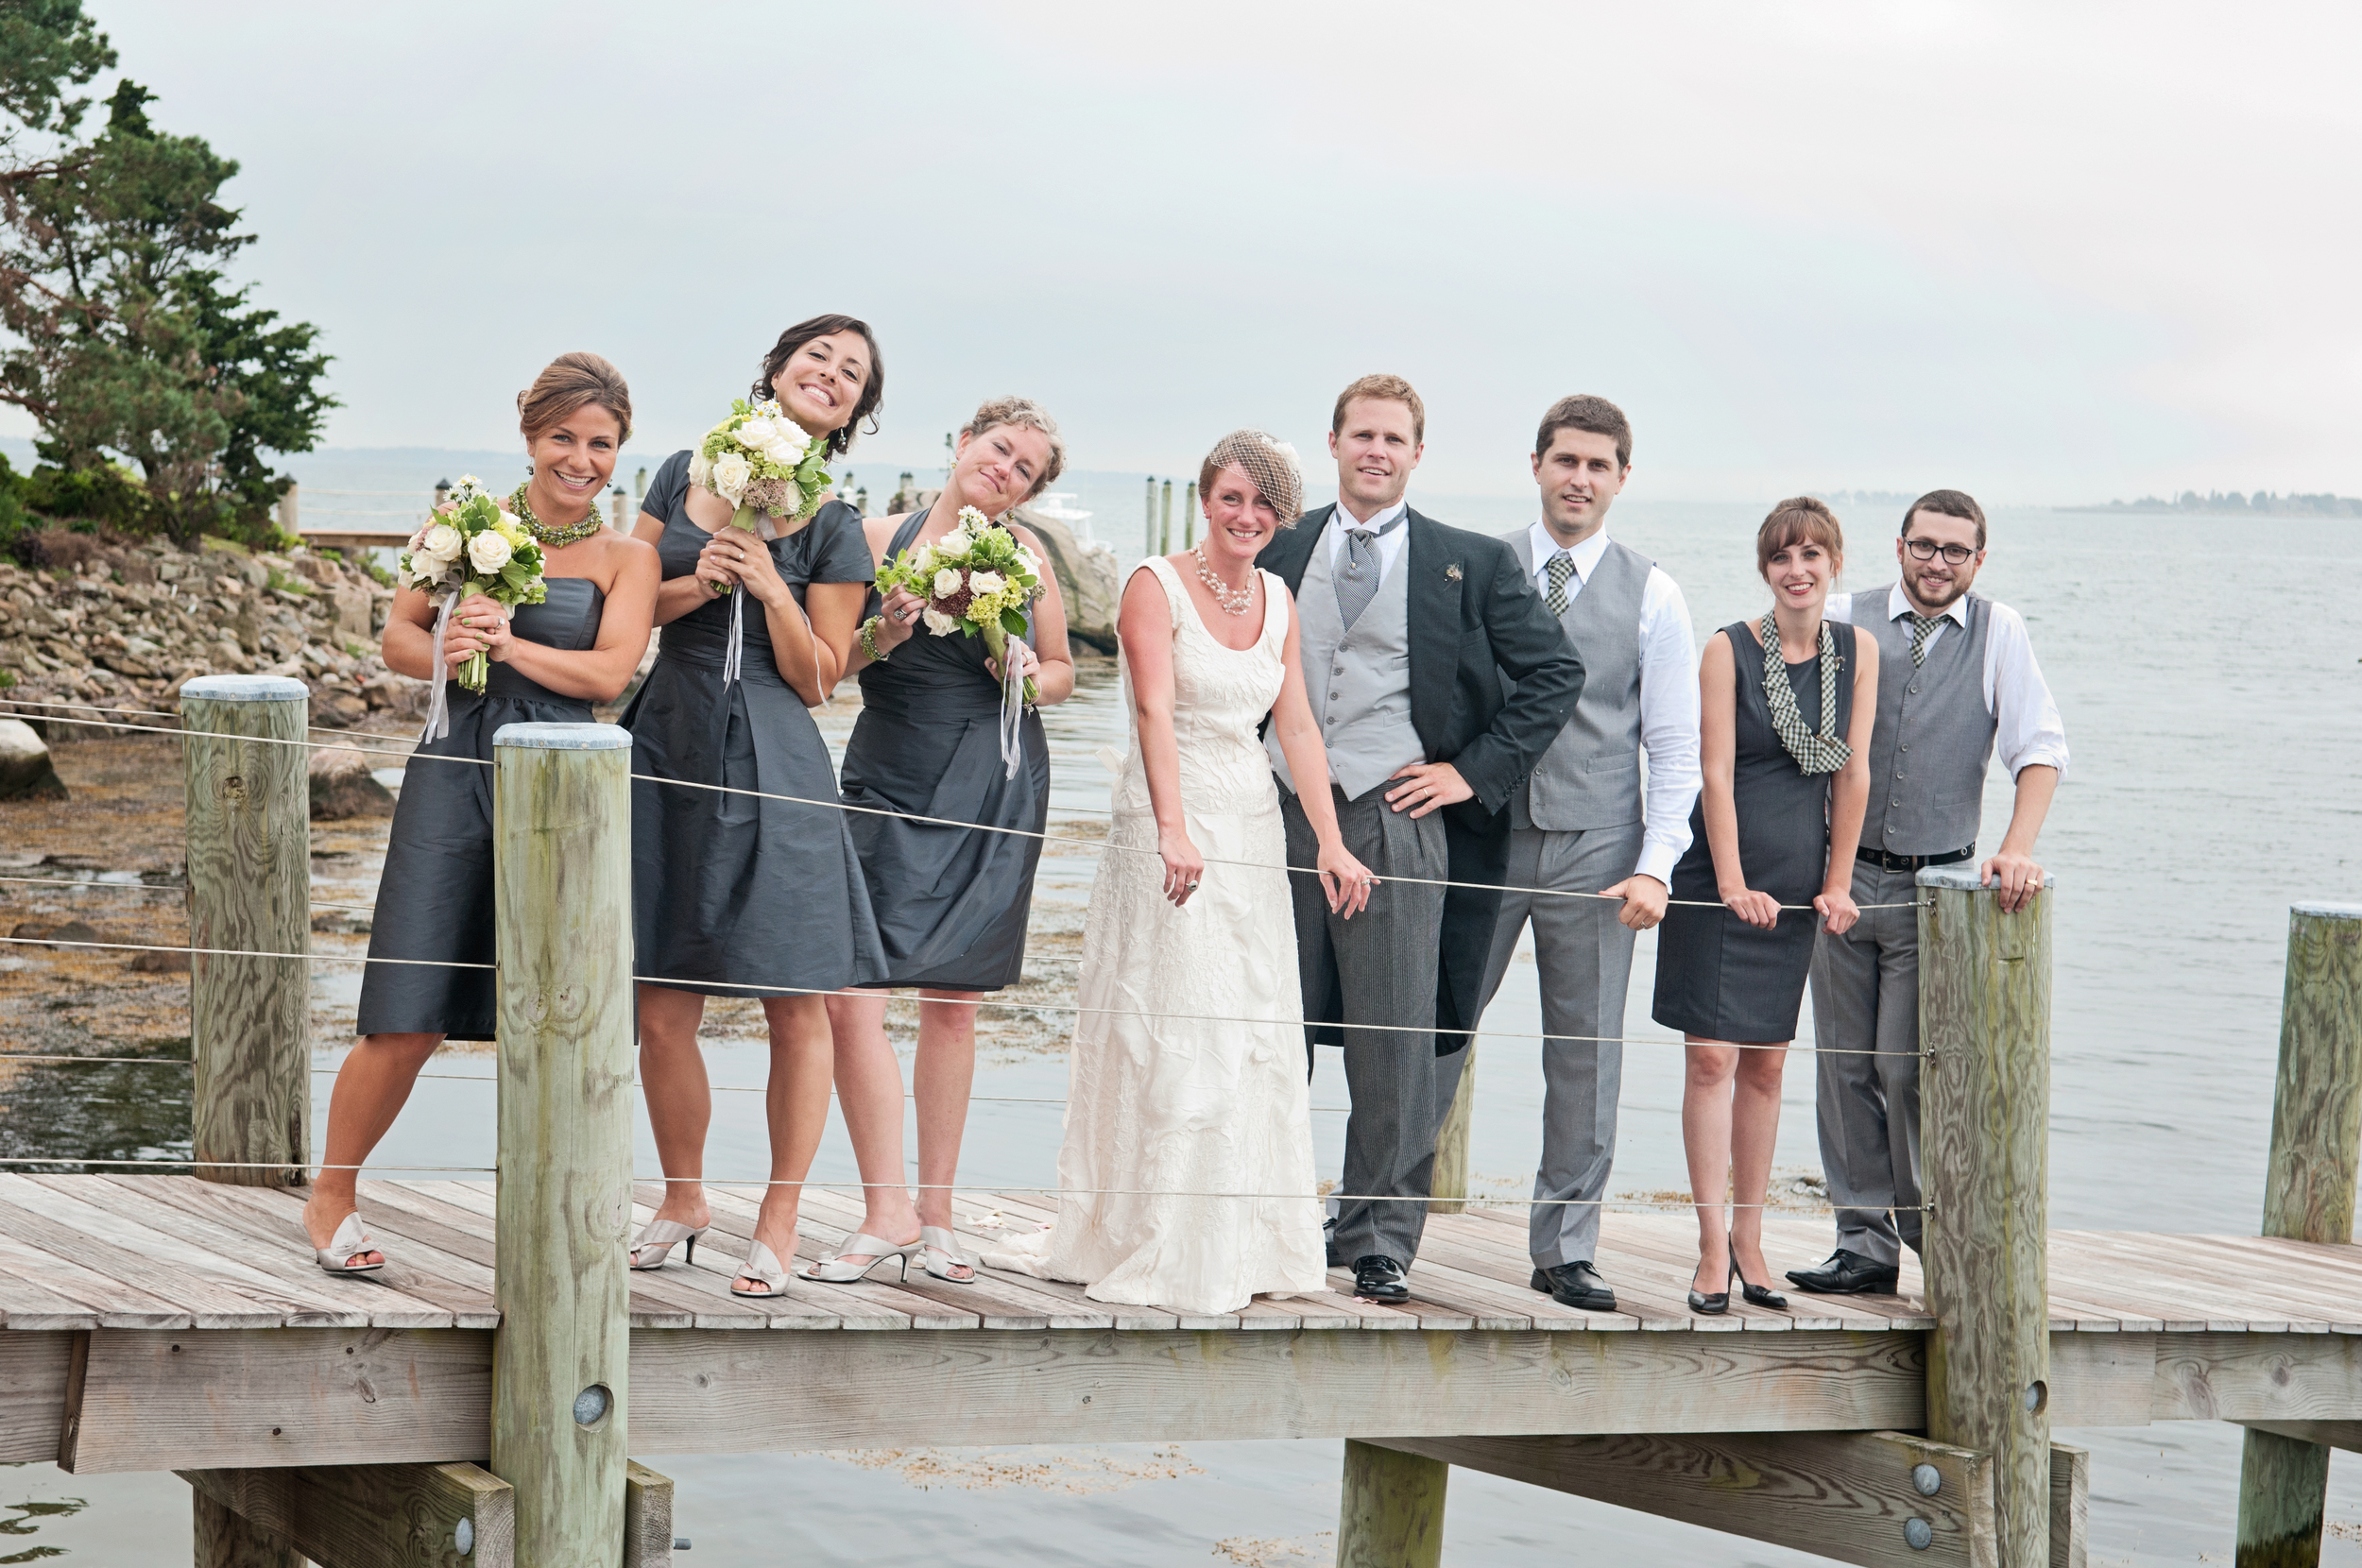 Angela_Chicoski_CT_wedding_photographer_090.jpg